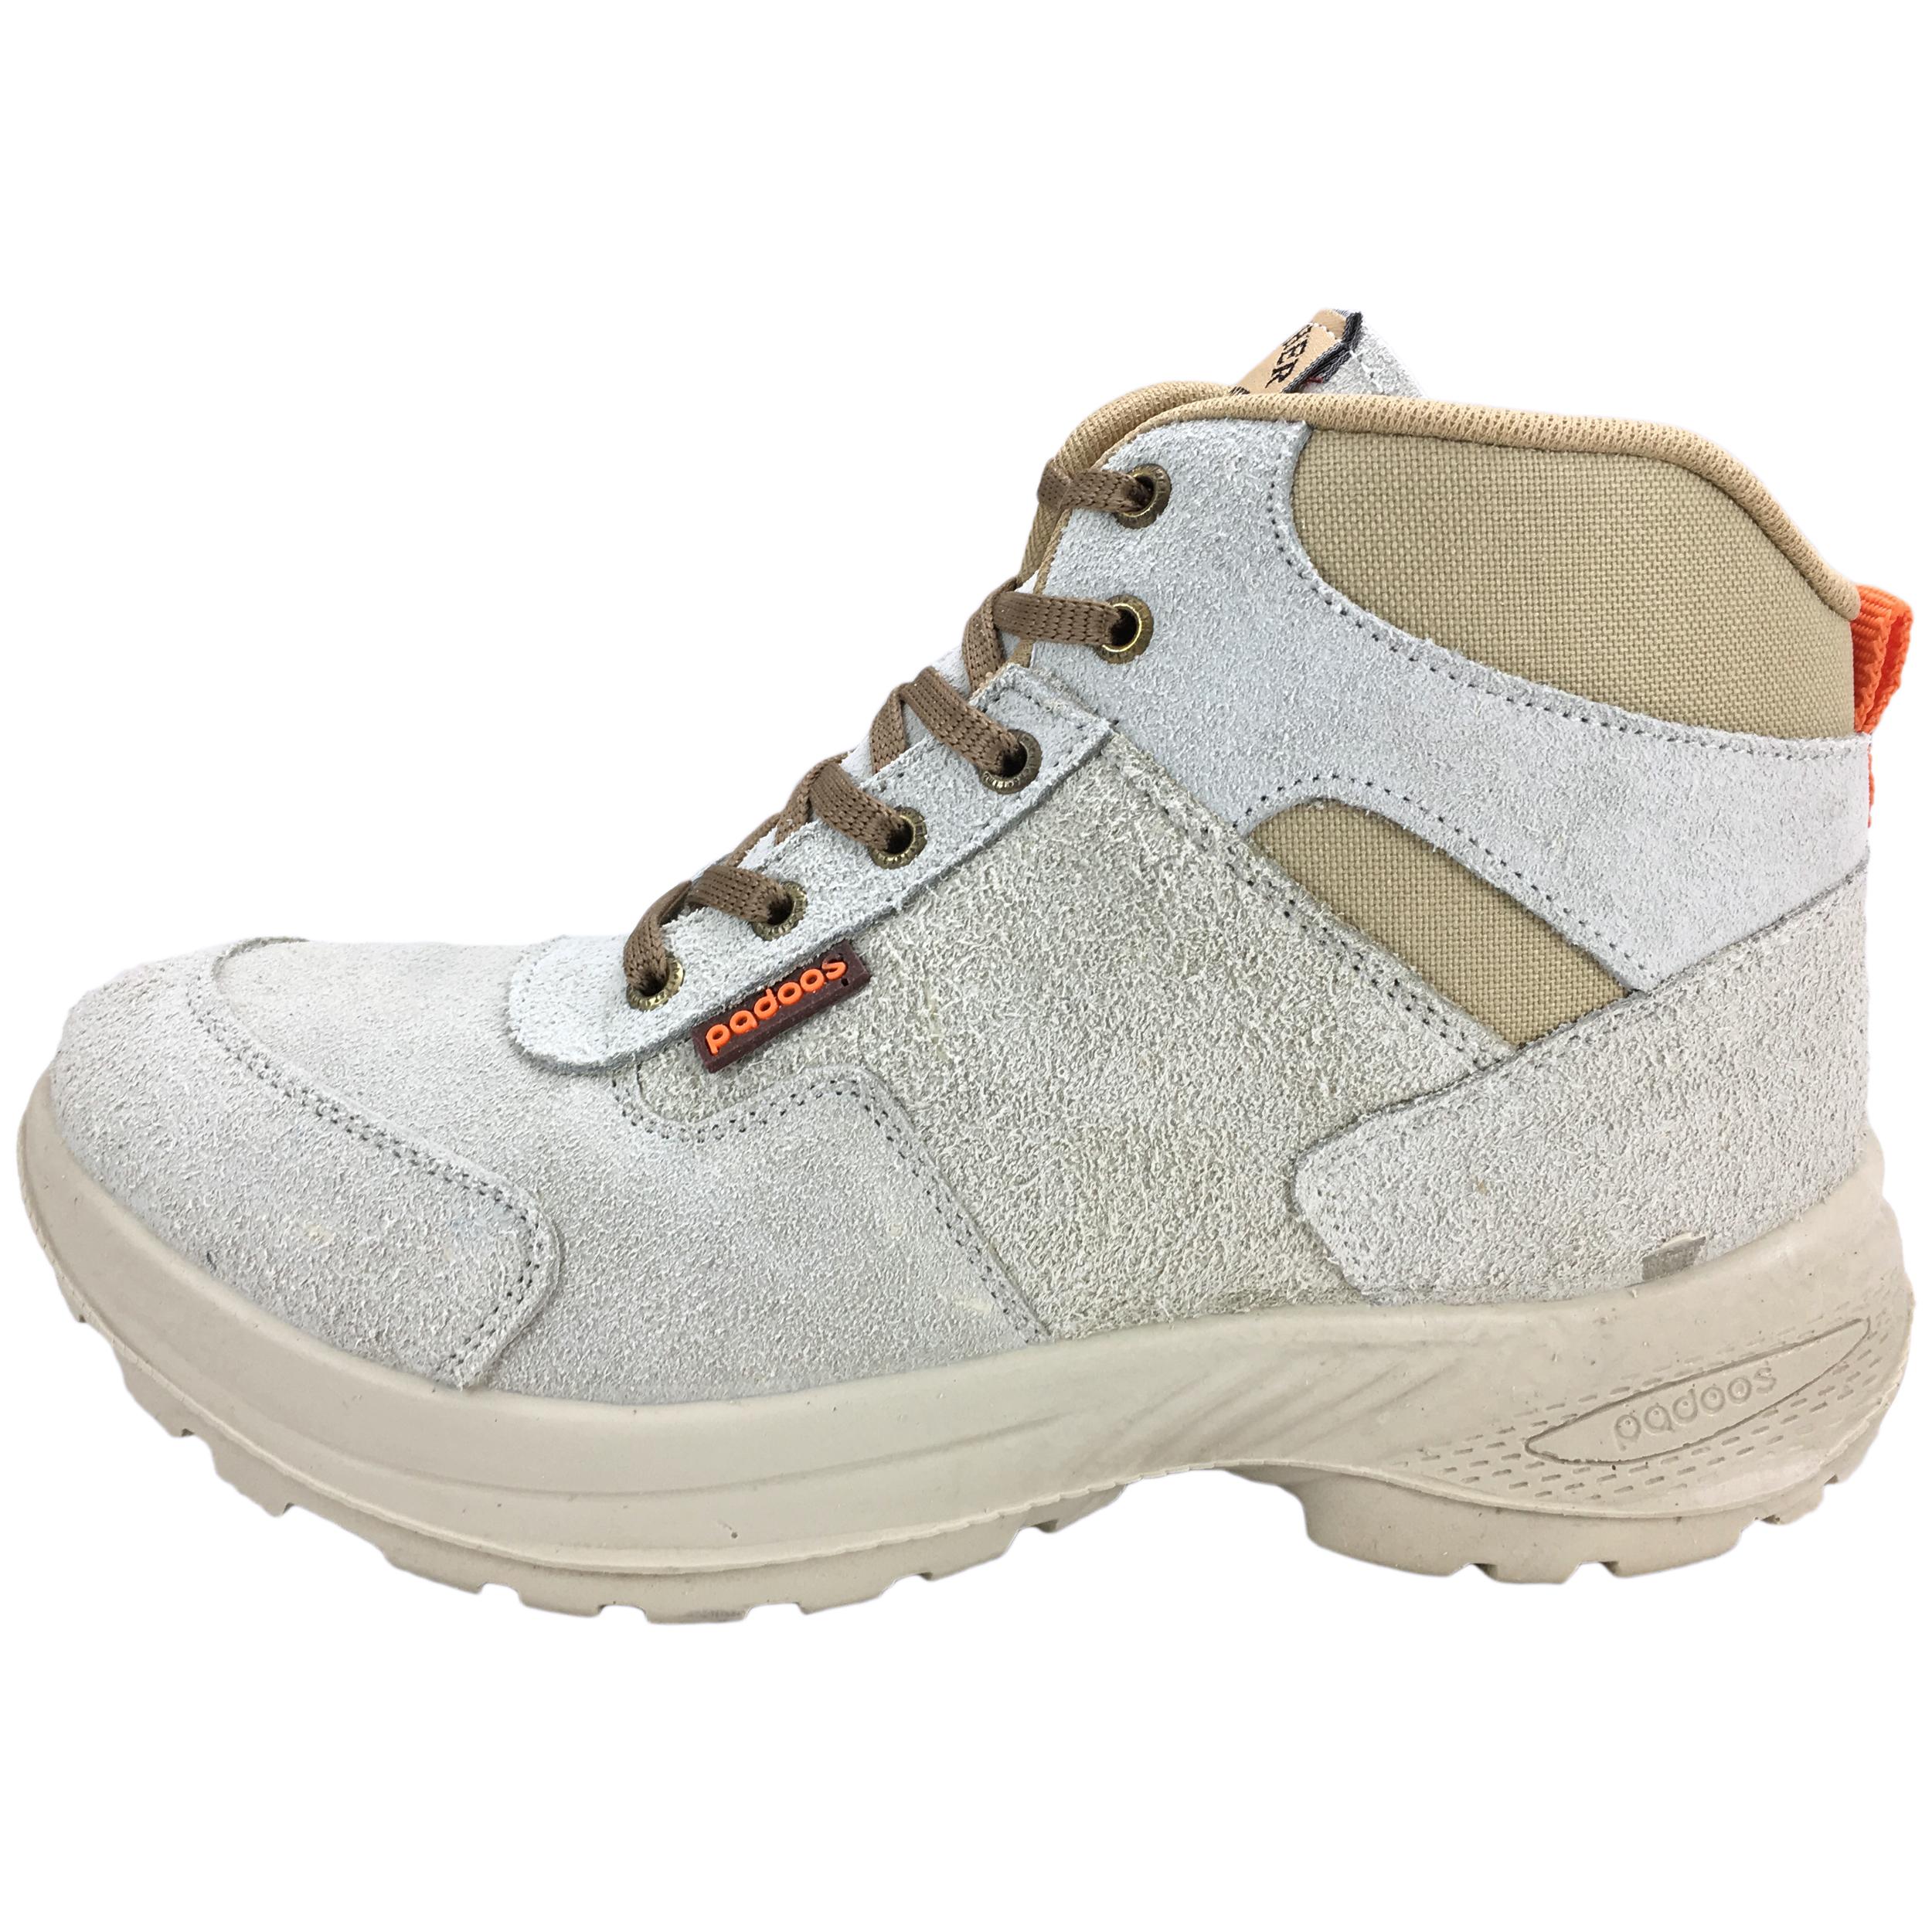 قیمت کفش کوهنوردی مردانه پادوس مدل اسلوبی کد 3240